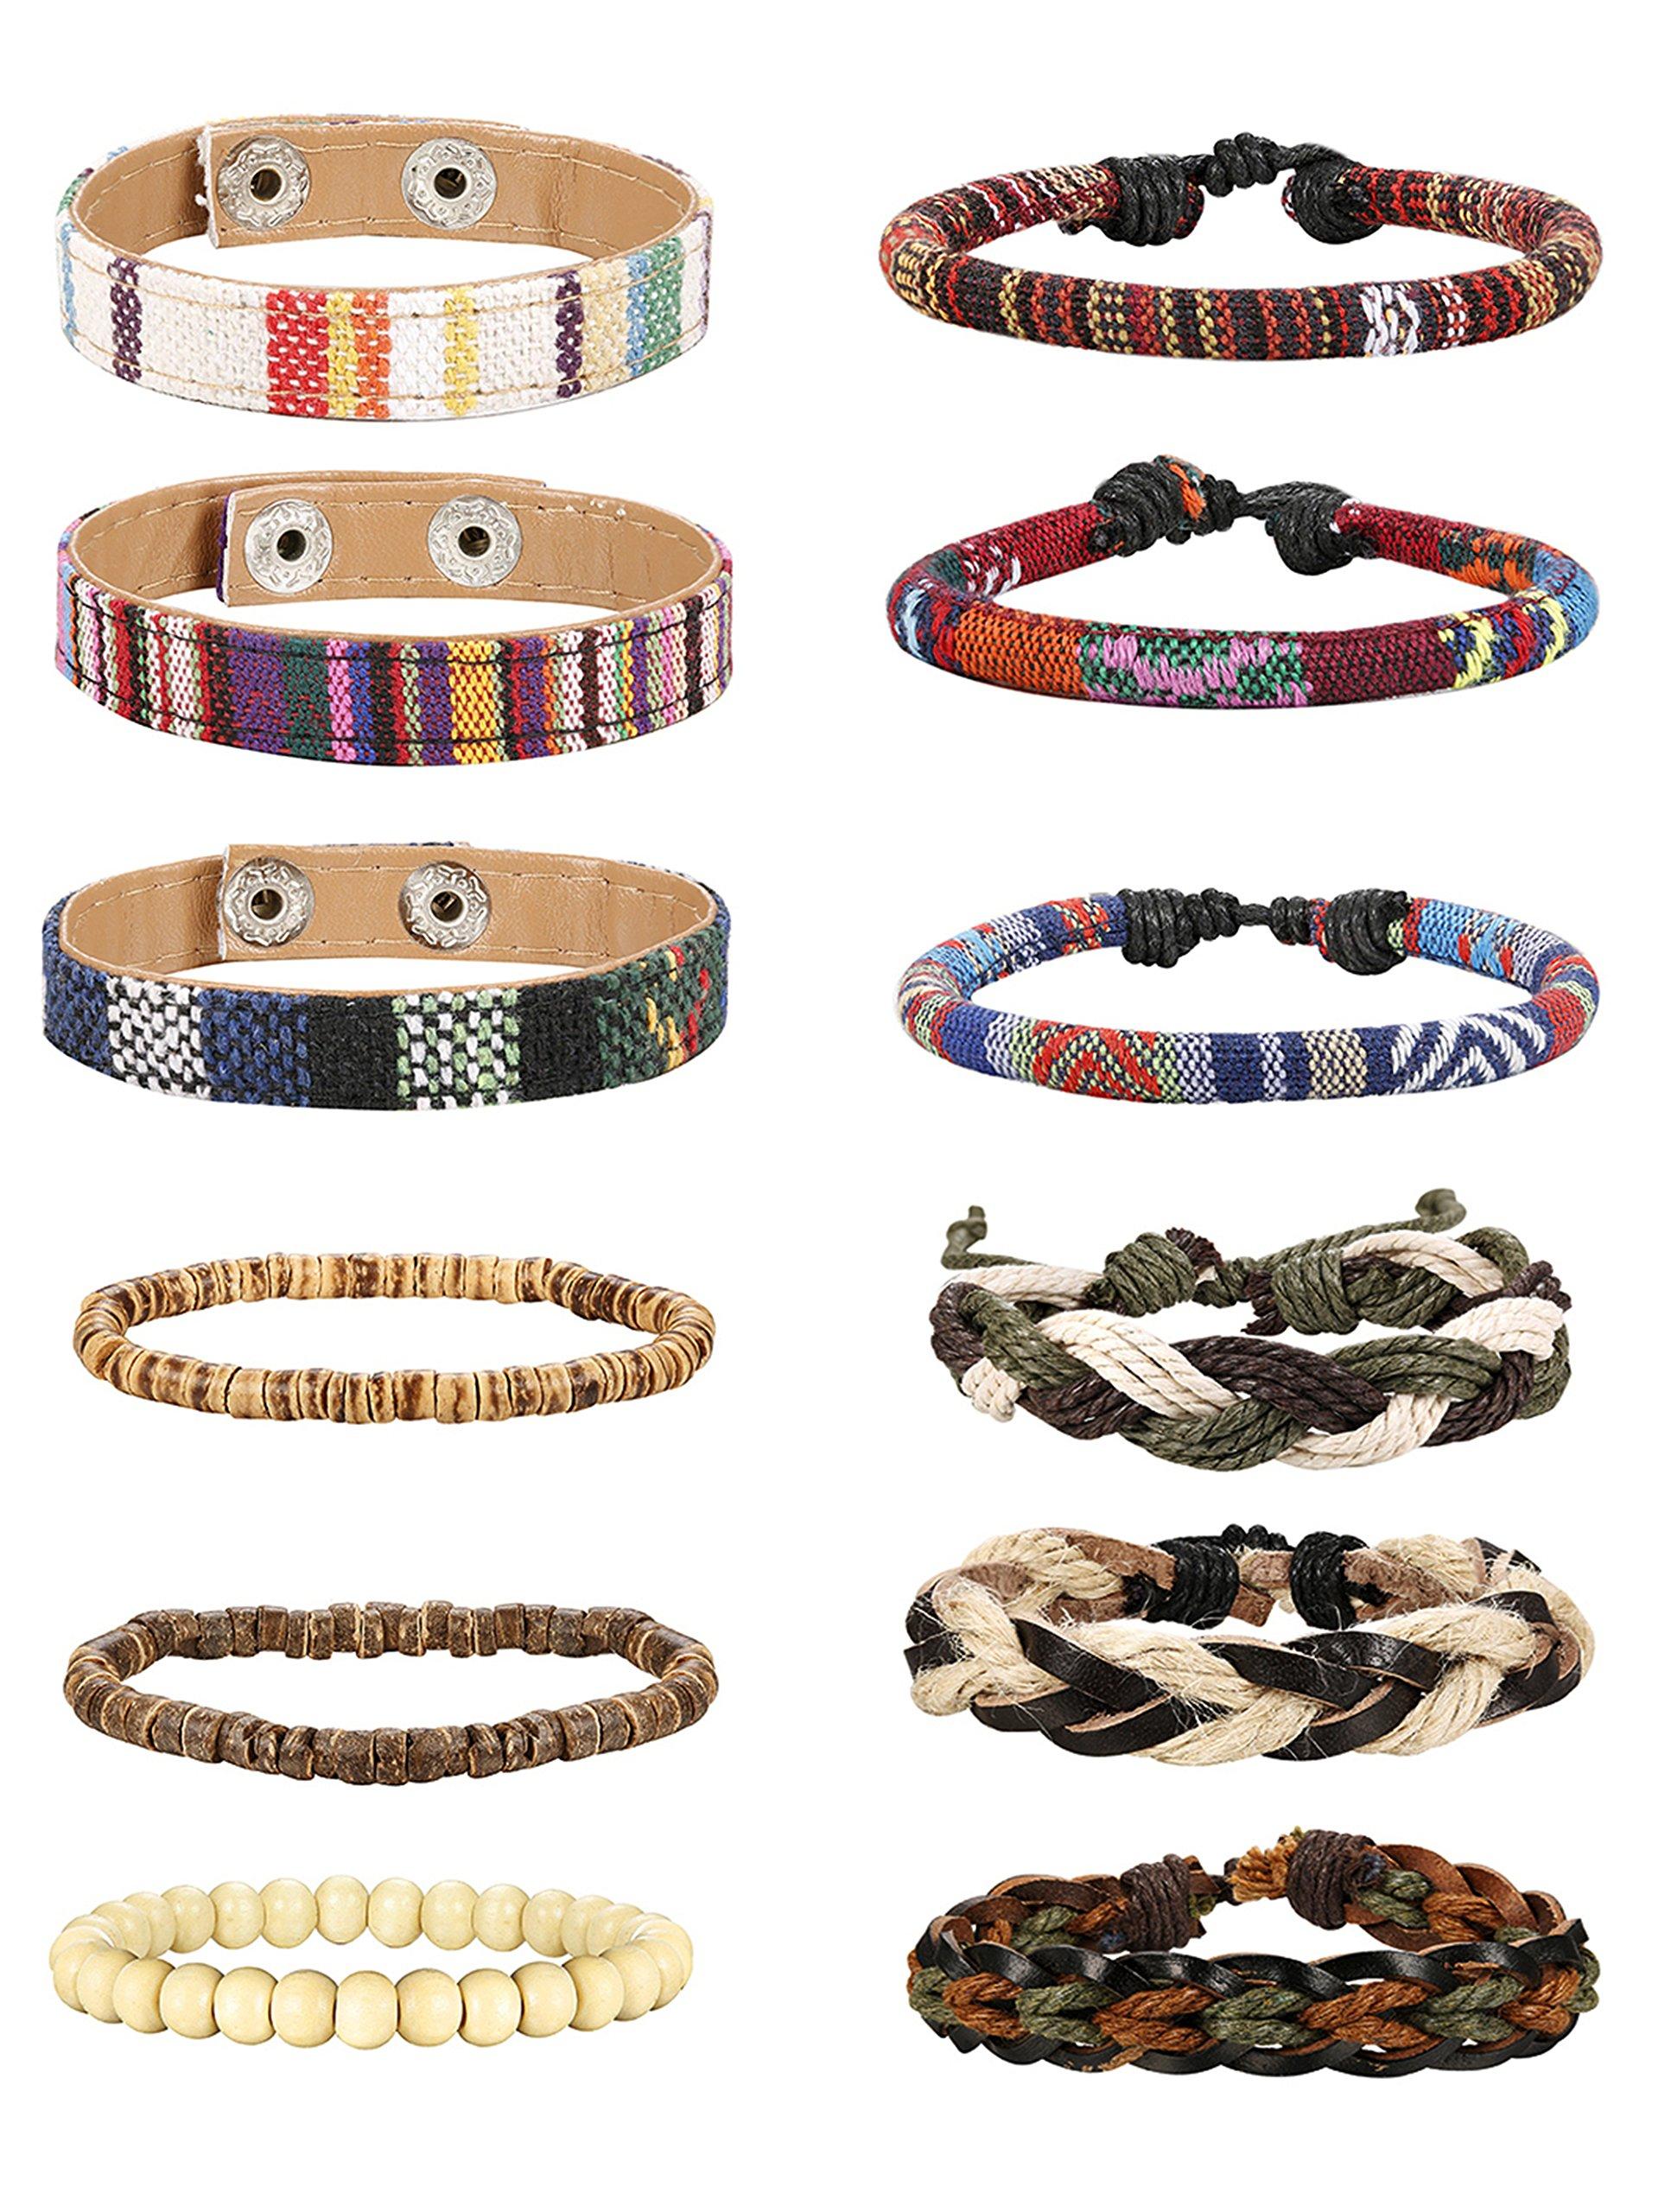 Jstyle 6-12Pcs Wrap Bracelets for Women Men Hemp Cords Ethnic Tribal Bracelet Wooden Beads Leather Bracelets Wristbands by Jstyle (Image #1)